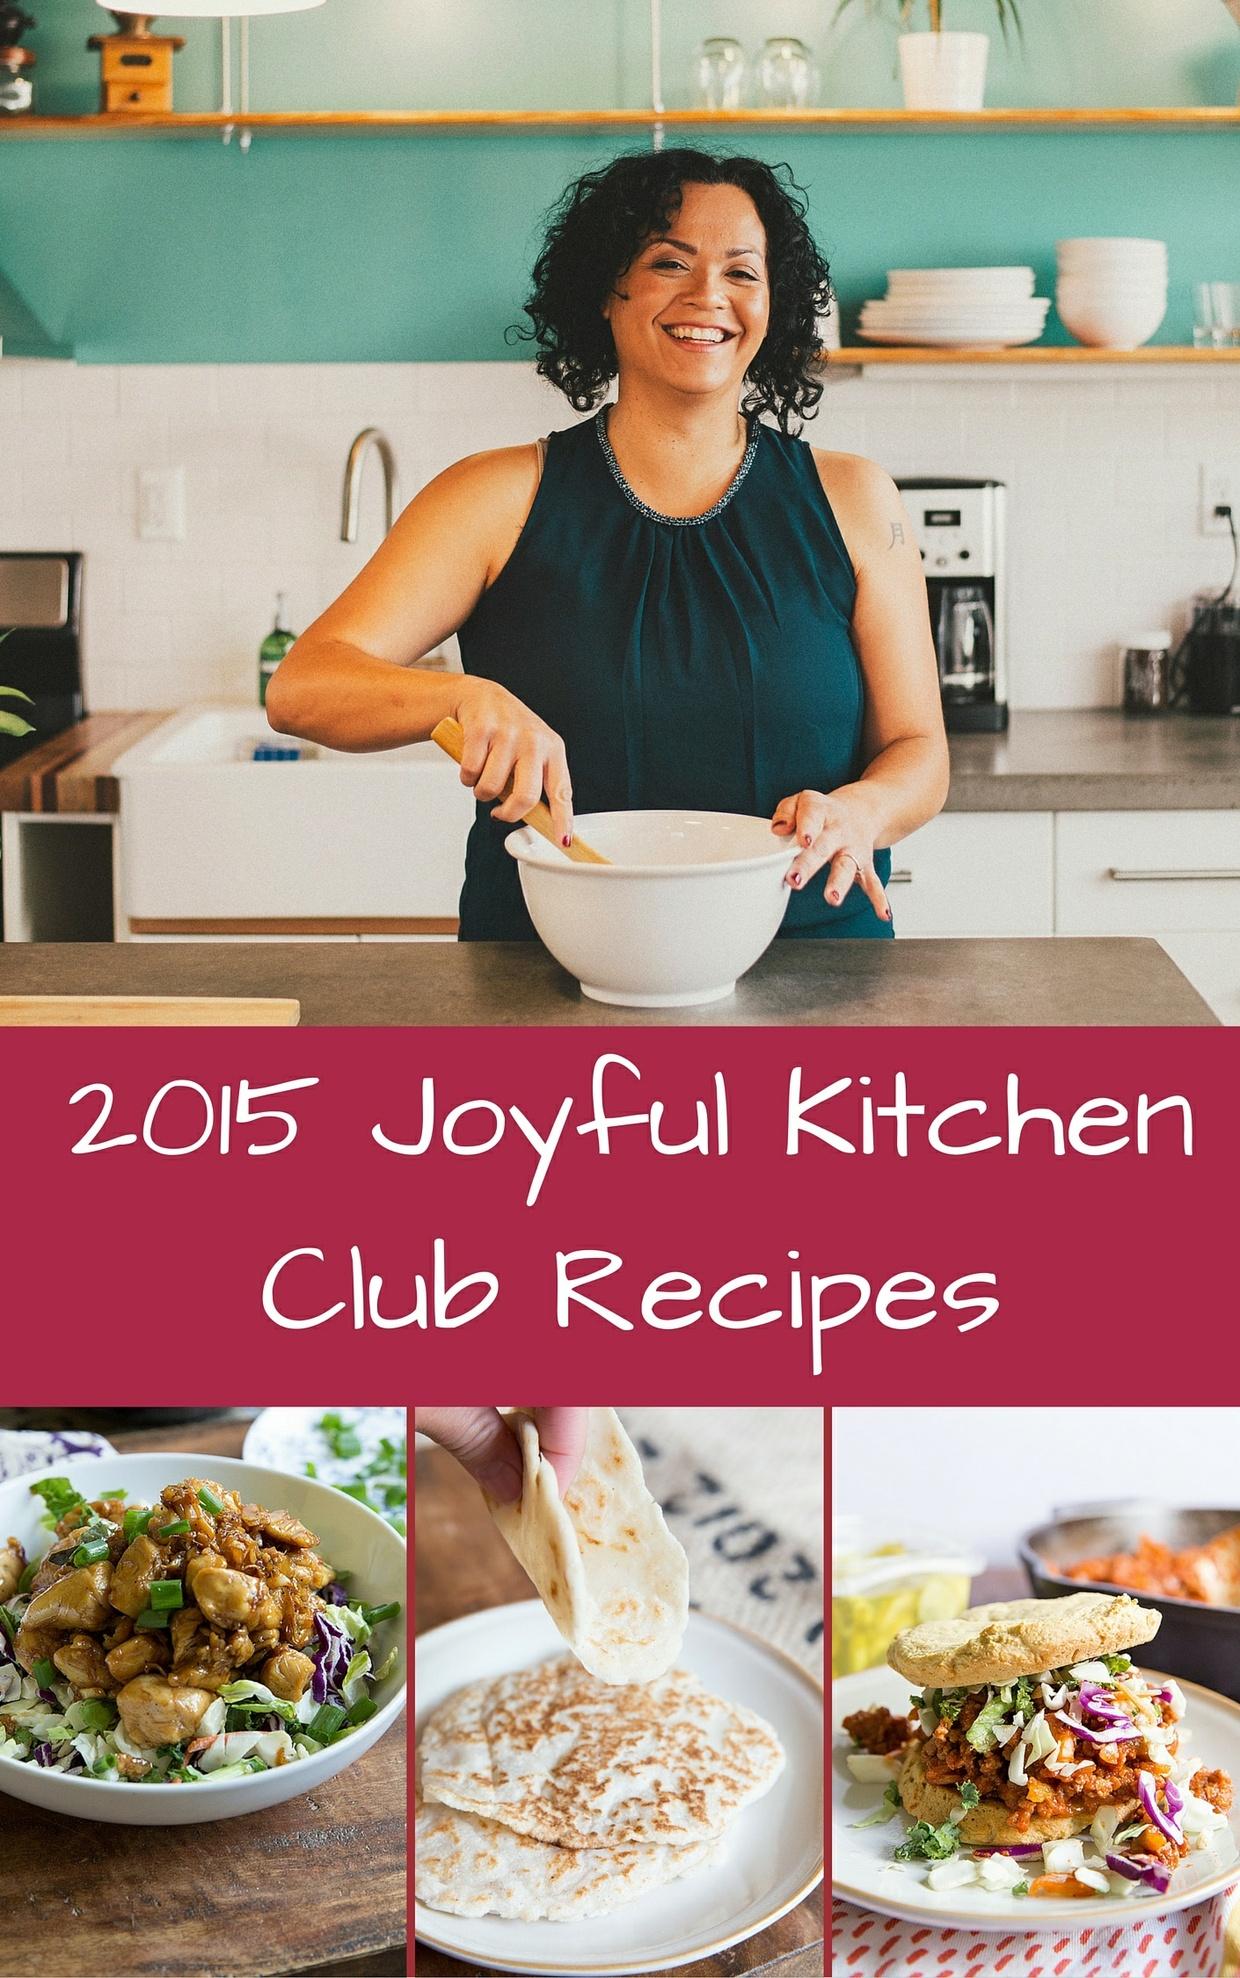 2015 Joyful Kitchen Club Recipes